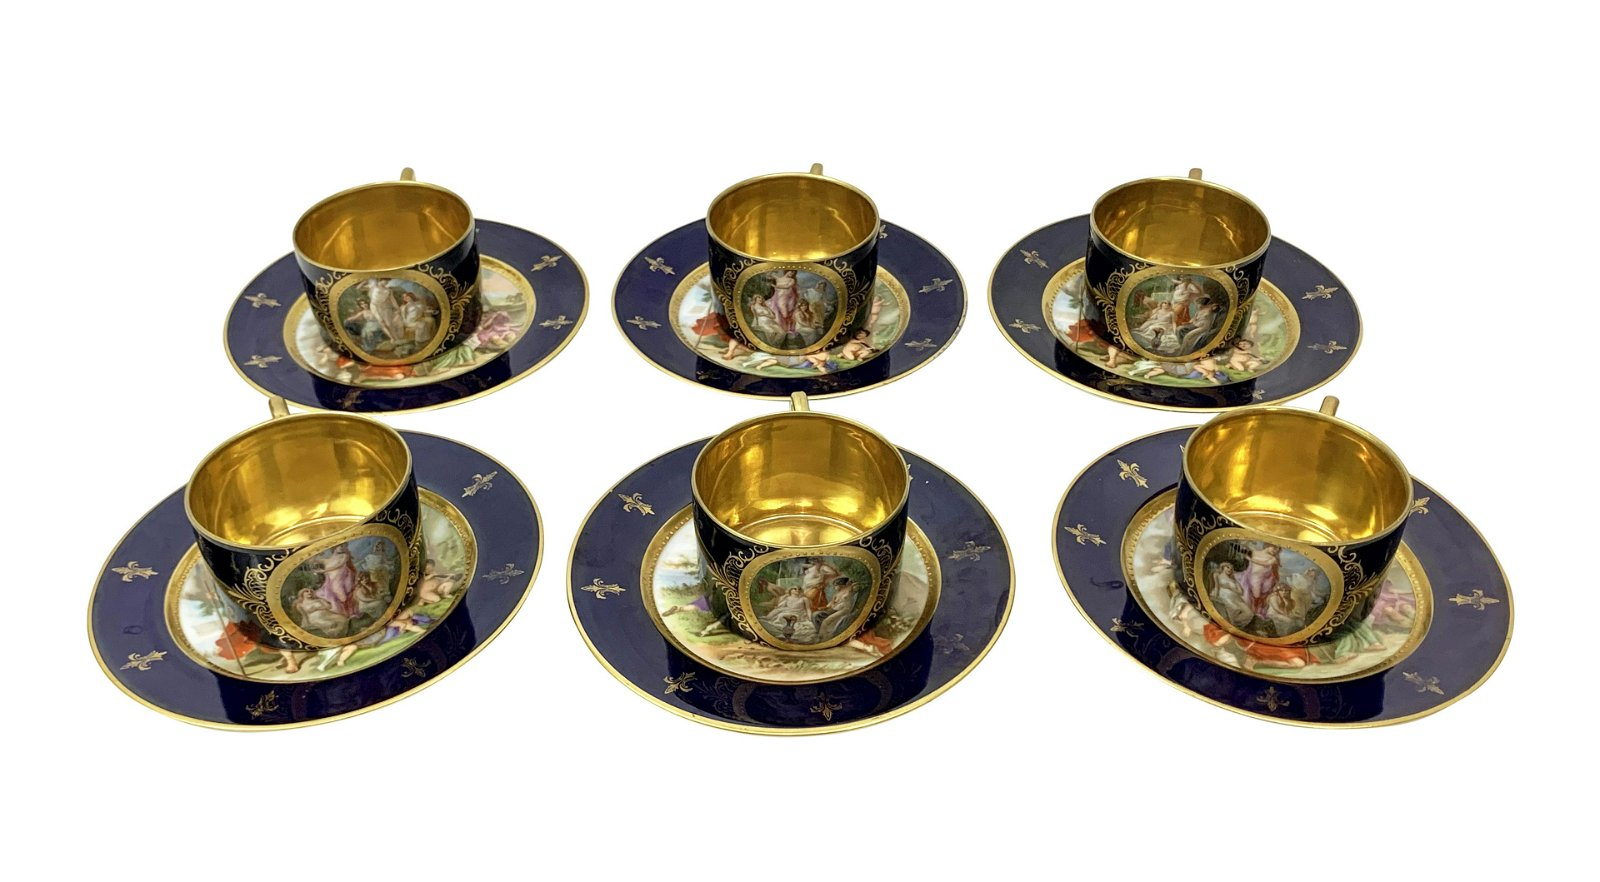 Svc For Six Royal Vienna Cobalt Teacups & Saucers